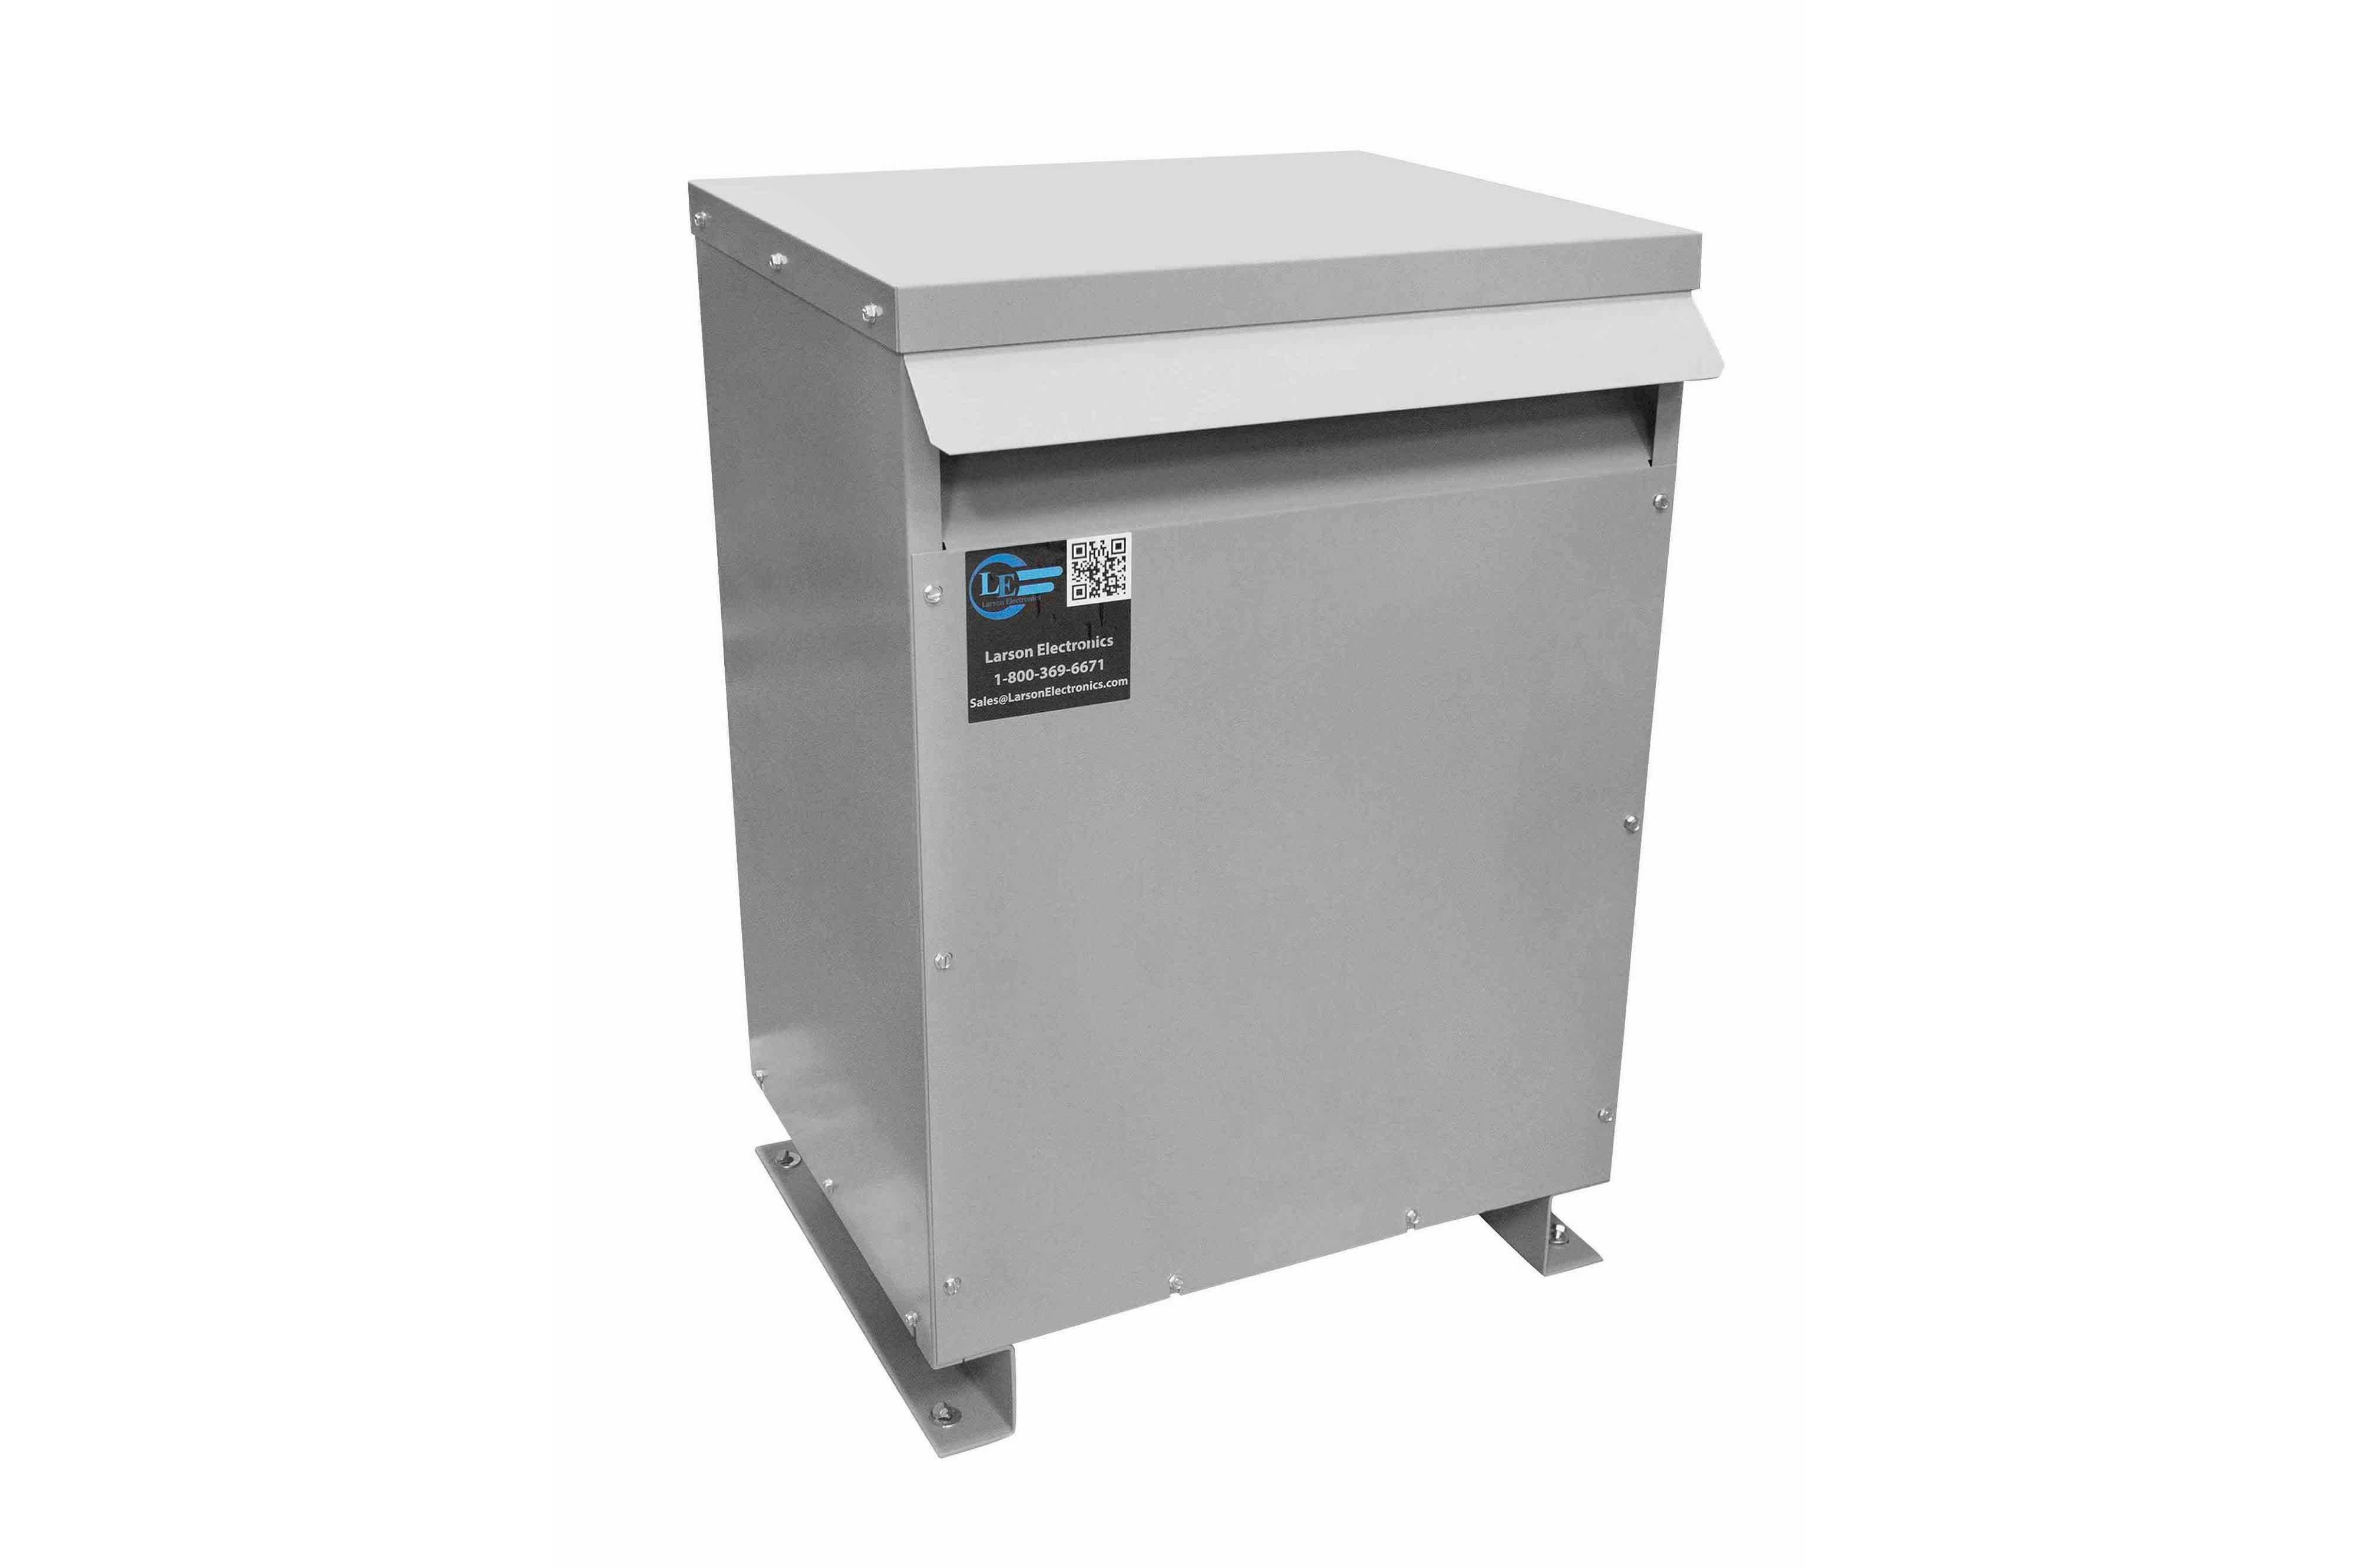 9 kVA 3PH Isolation Transformer, 415V Wye Primary, 480V Delta Secondary, N3R, Ventilated, 60 Hz